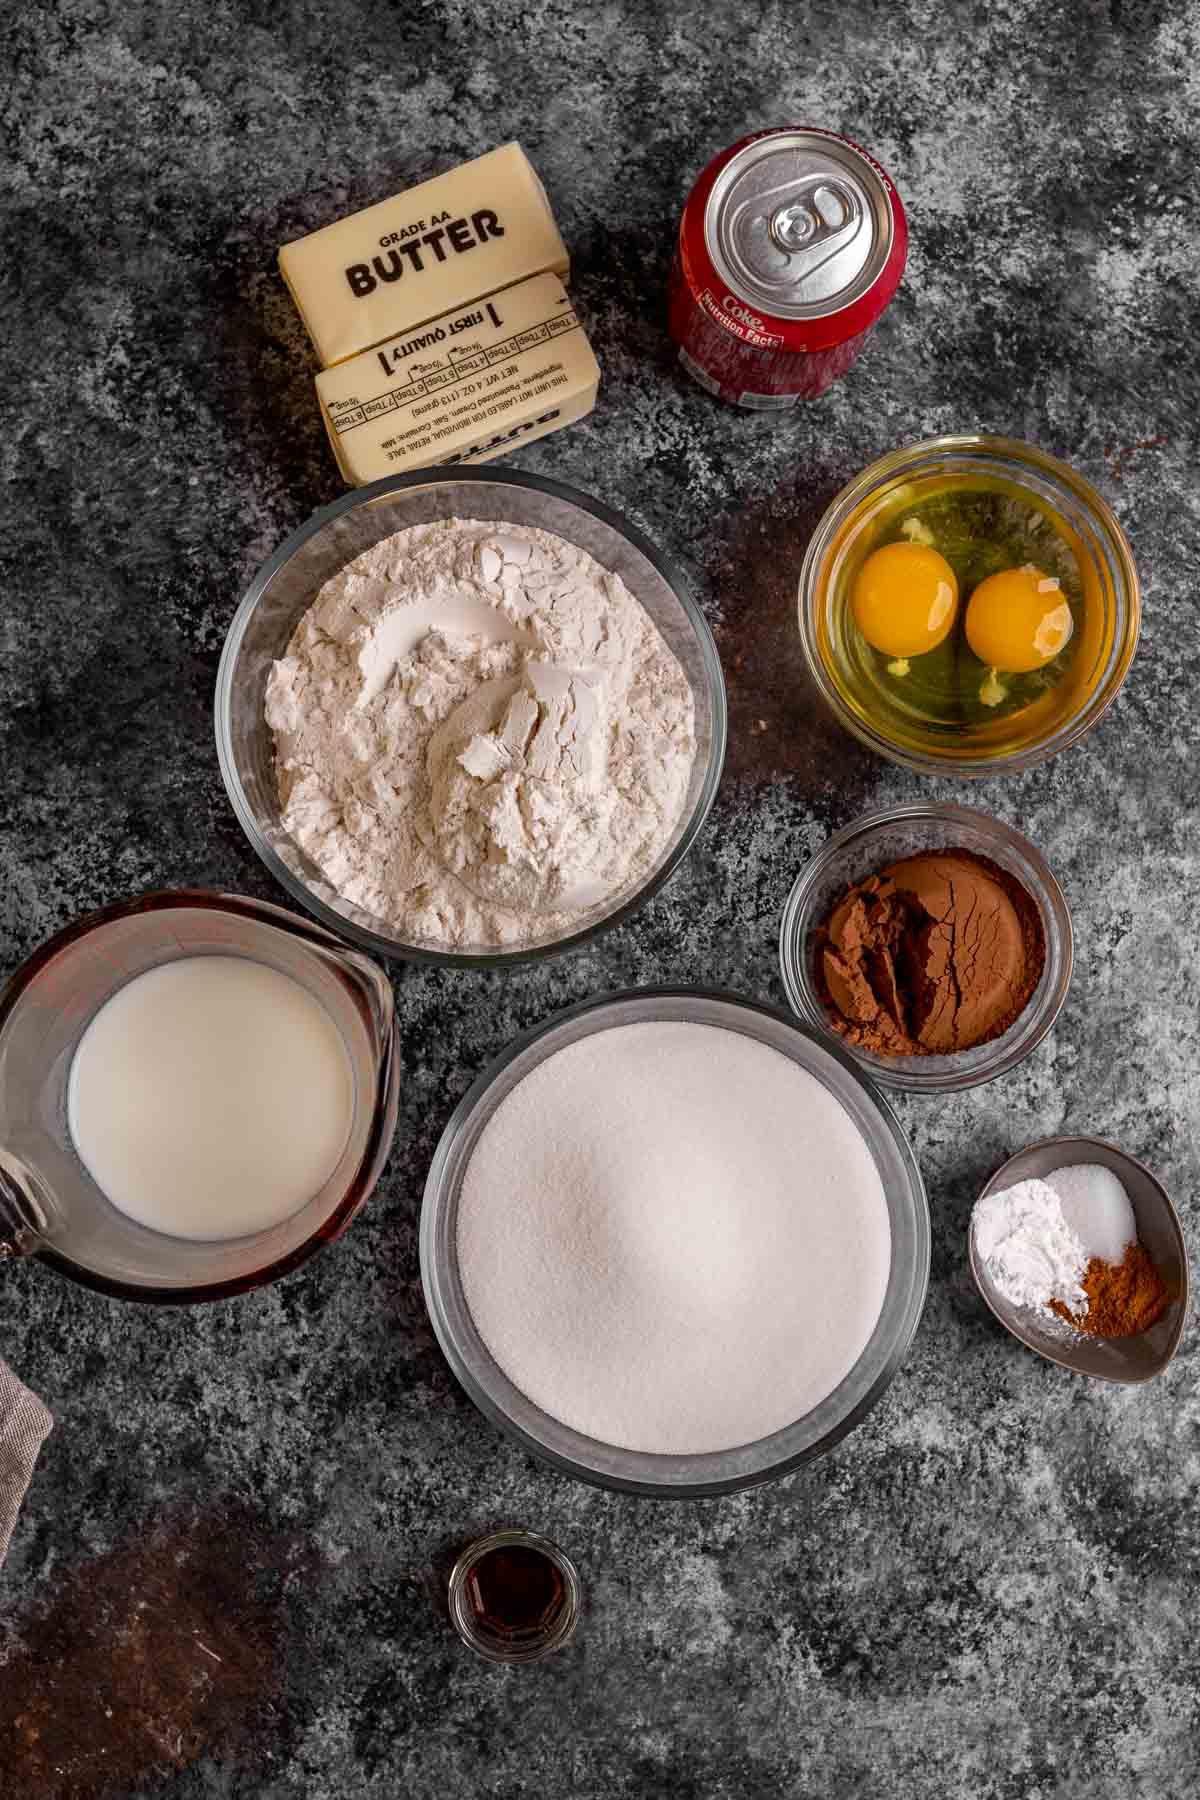 Coca Cola Sheet Cake ingredients in bowls